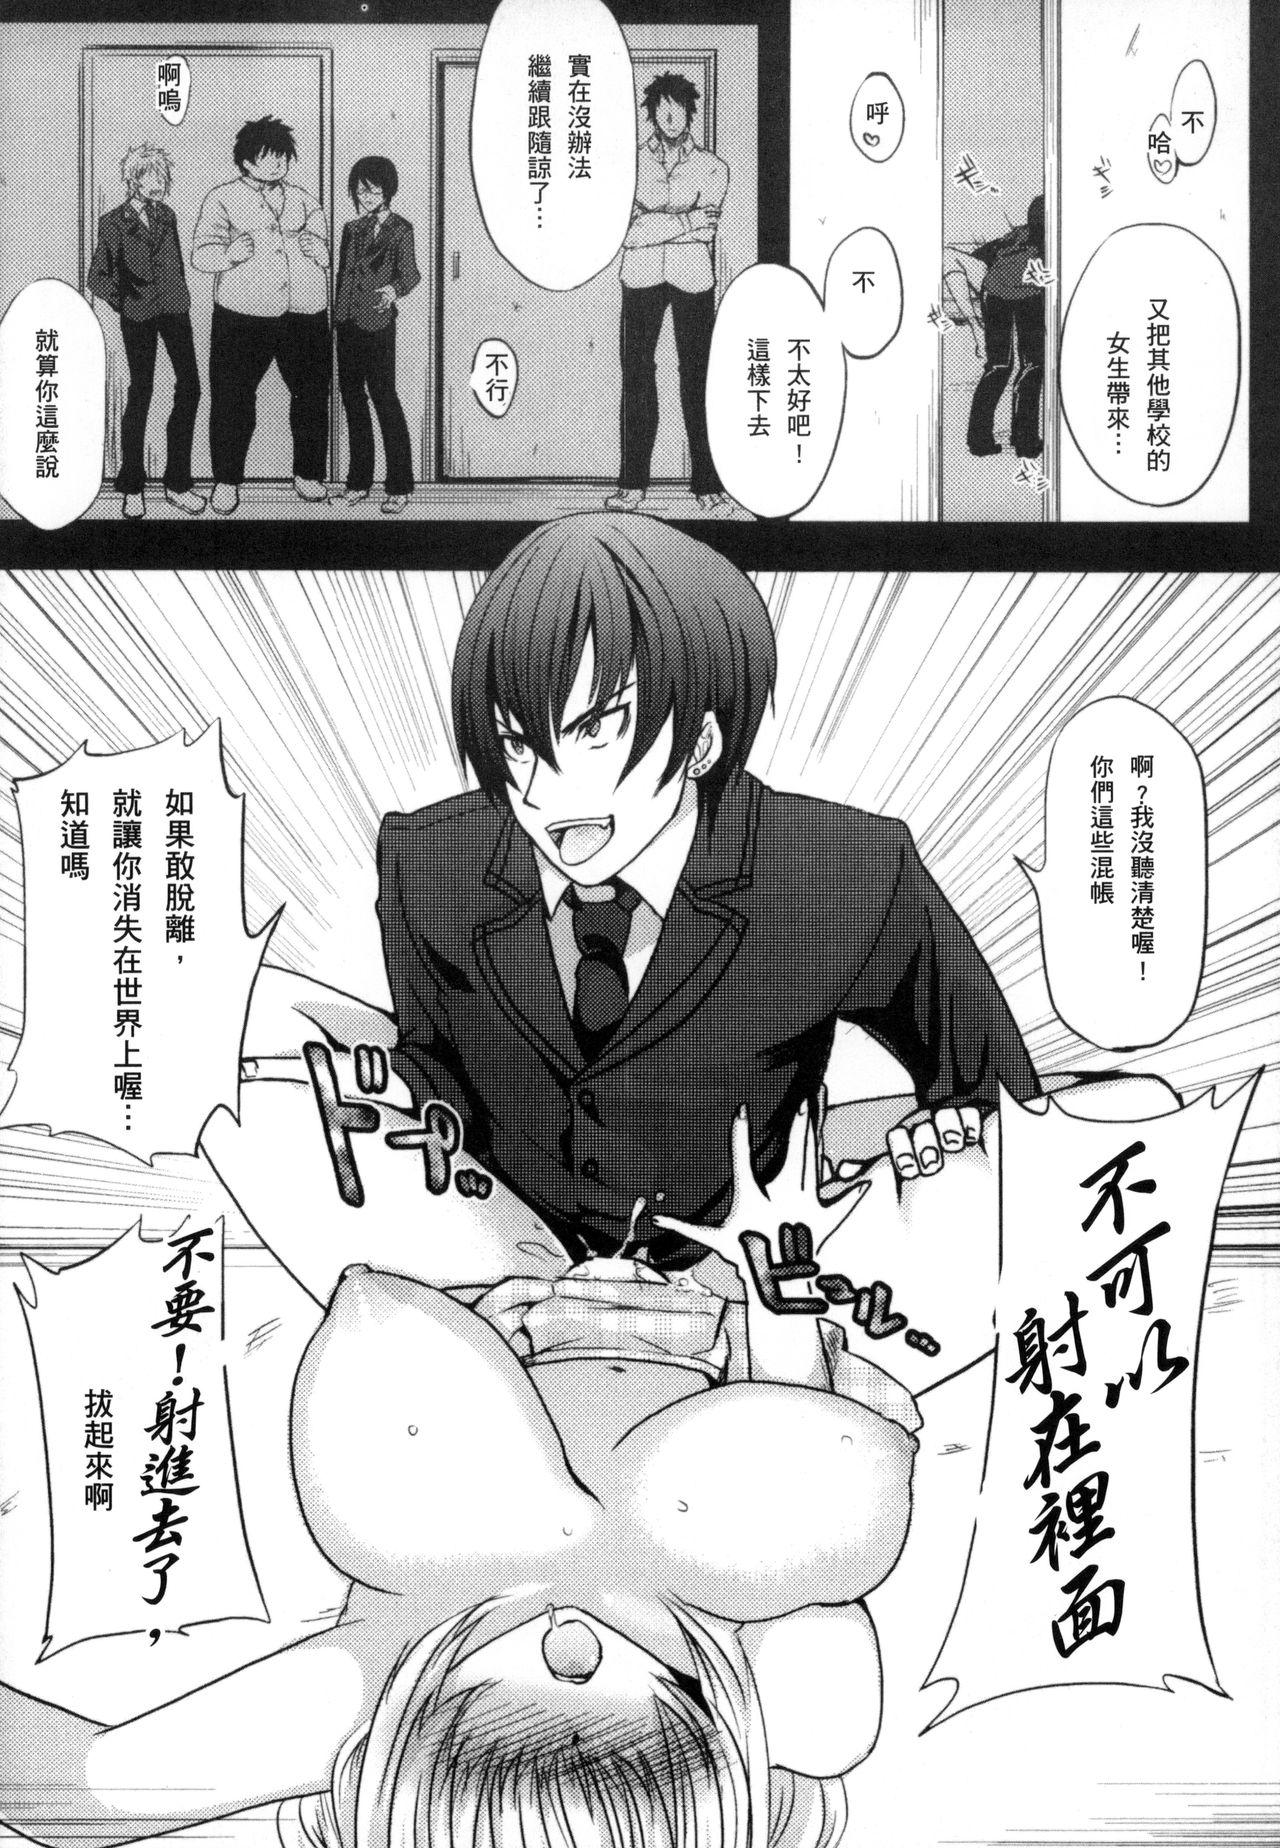 2D Comic Magazine Seitenkan Shite Haramasarete Botebara End! | 性轉換與懷孕,滿腹精液收場! 106